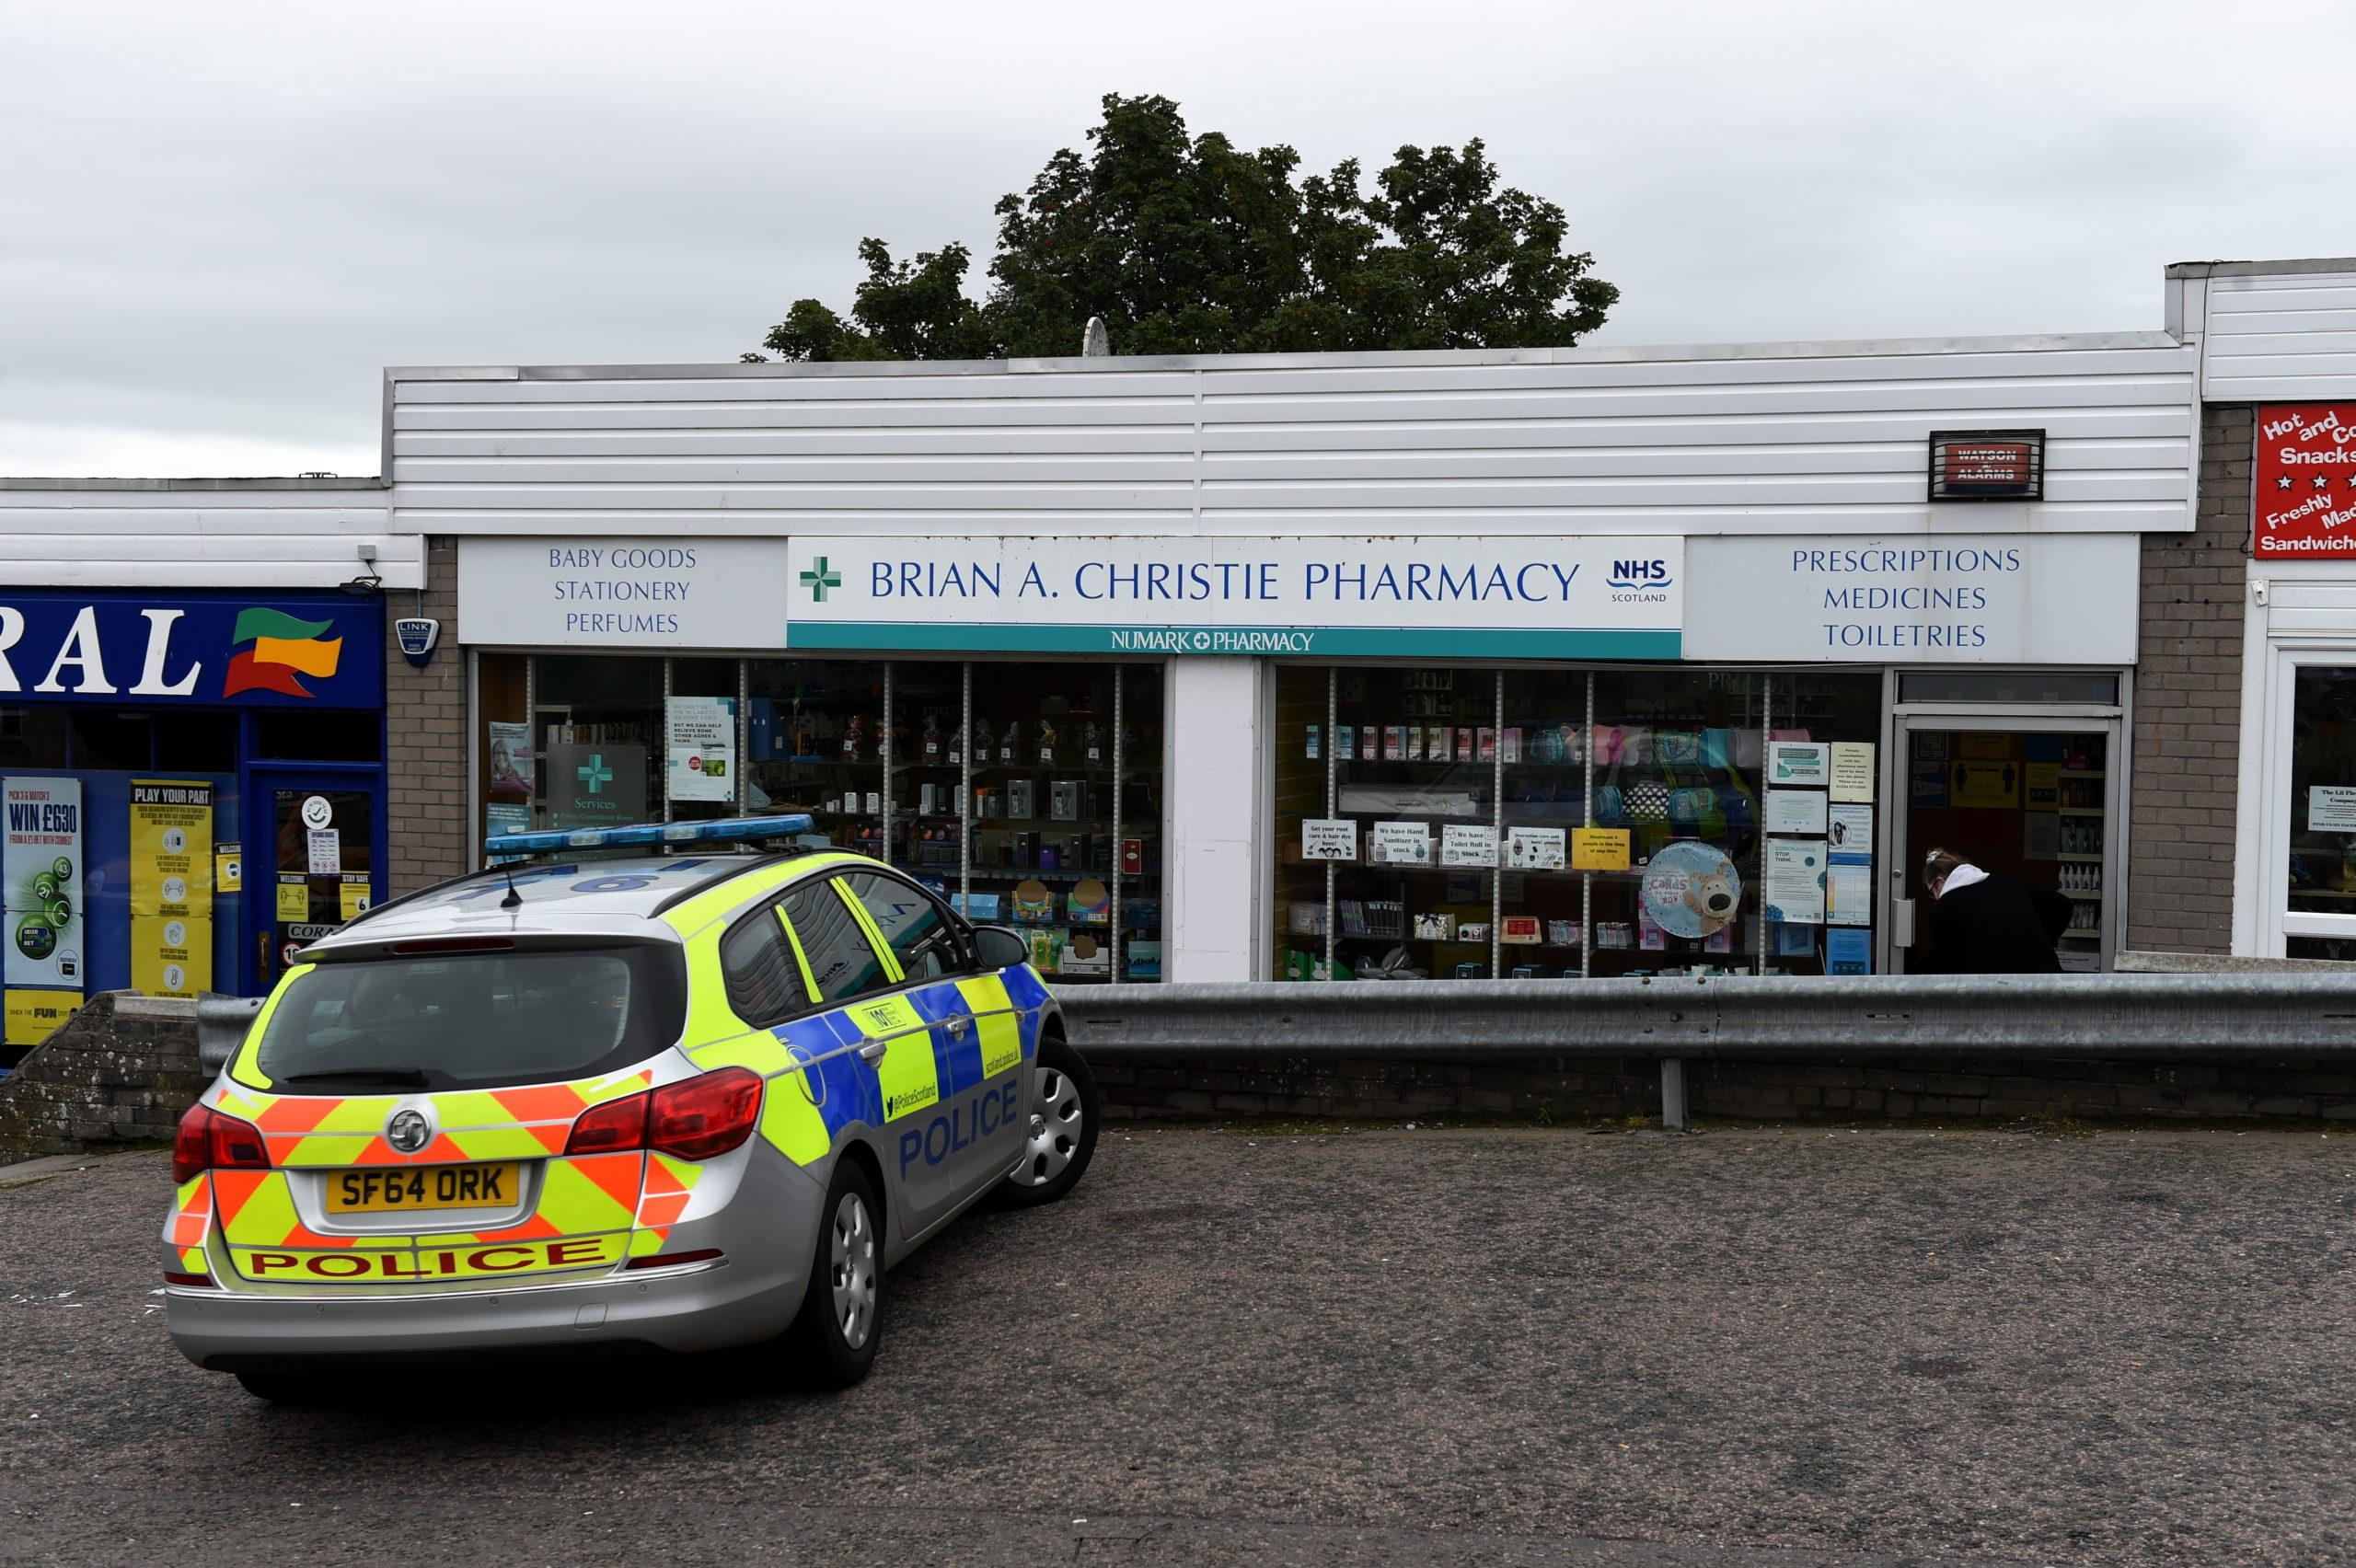 Brian A Christie Pharmacy in Bucksburn